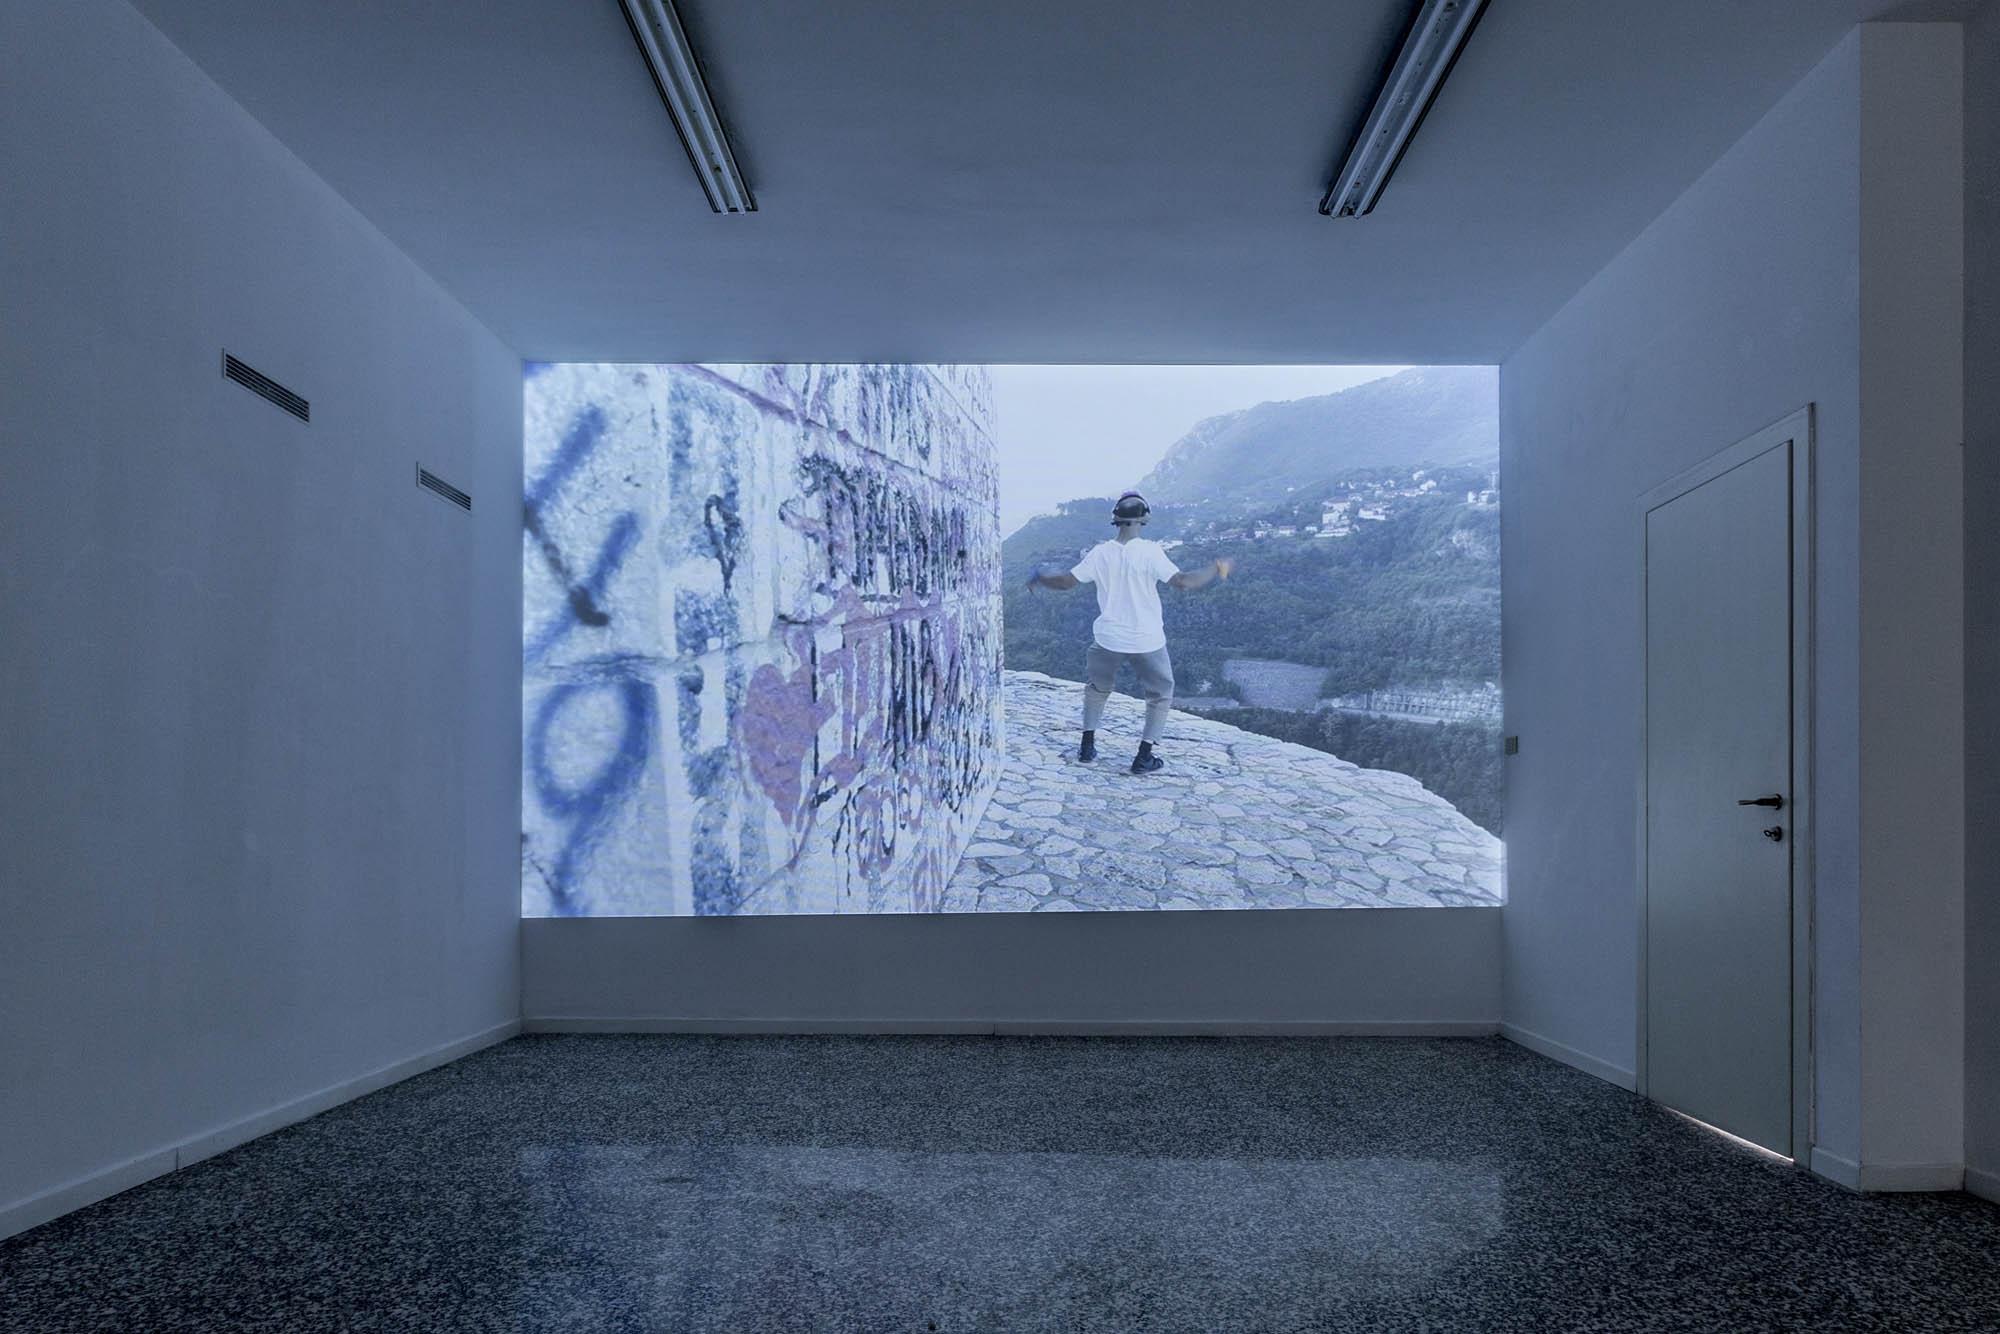 Lucia Cristiani, Passerò domani, 2016, Installation view (Still frame from video), photo Giulia Spreafico, courtesy of the artist and t-space